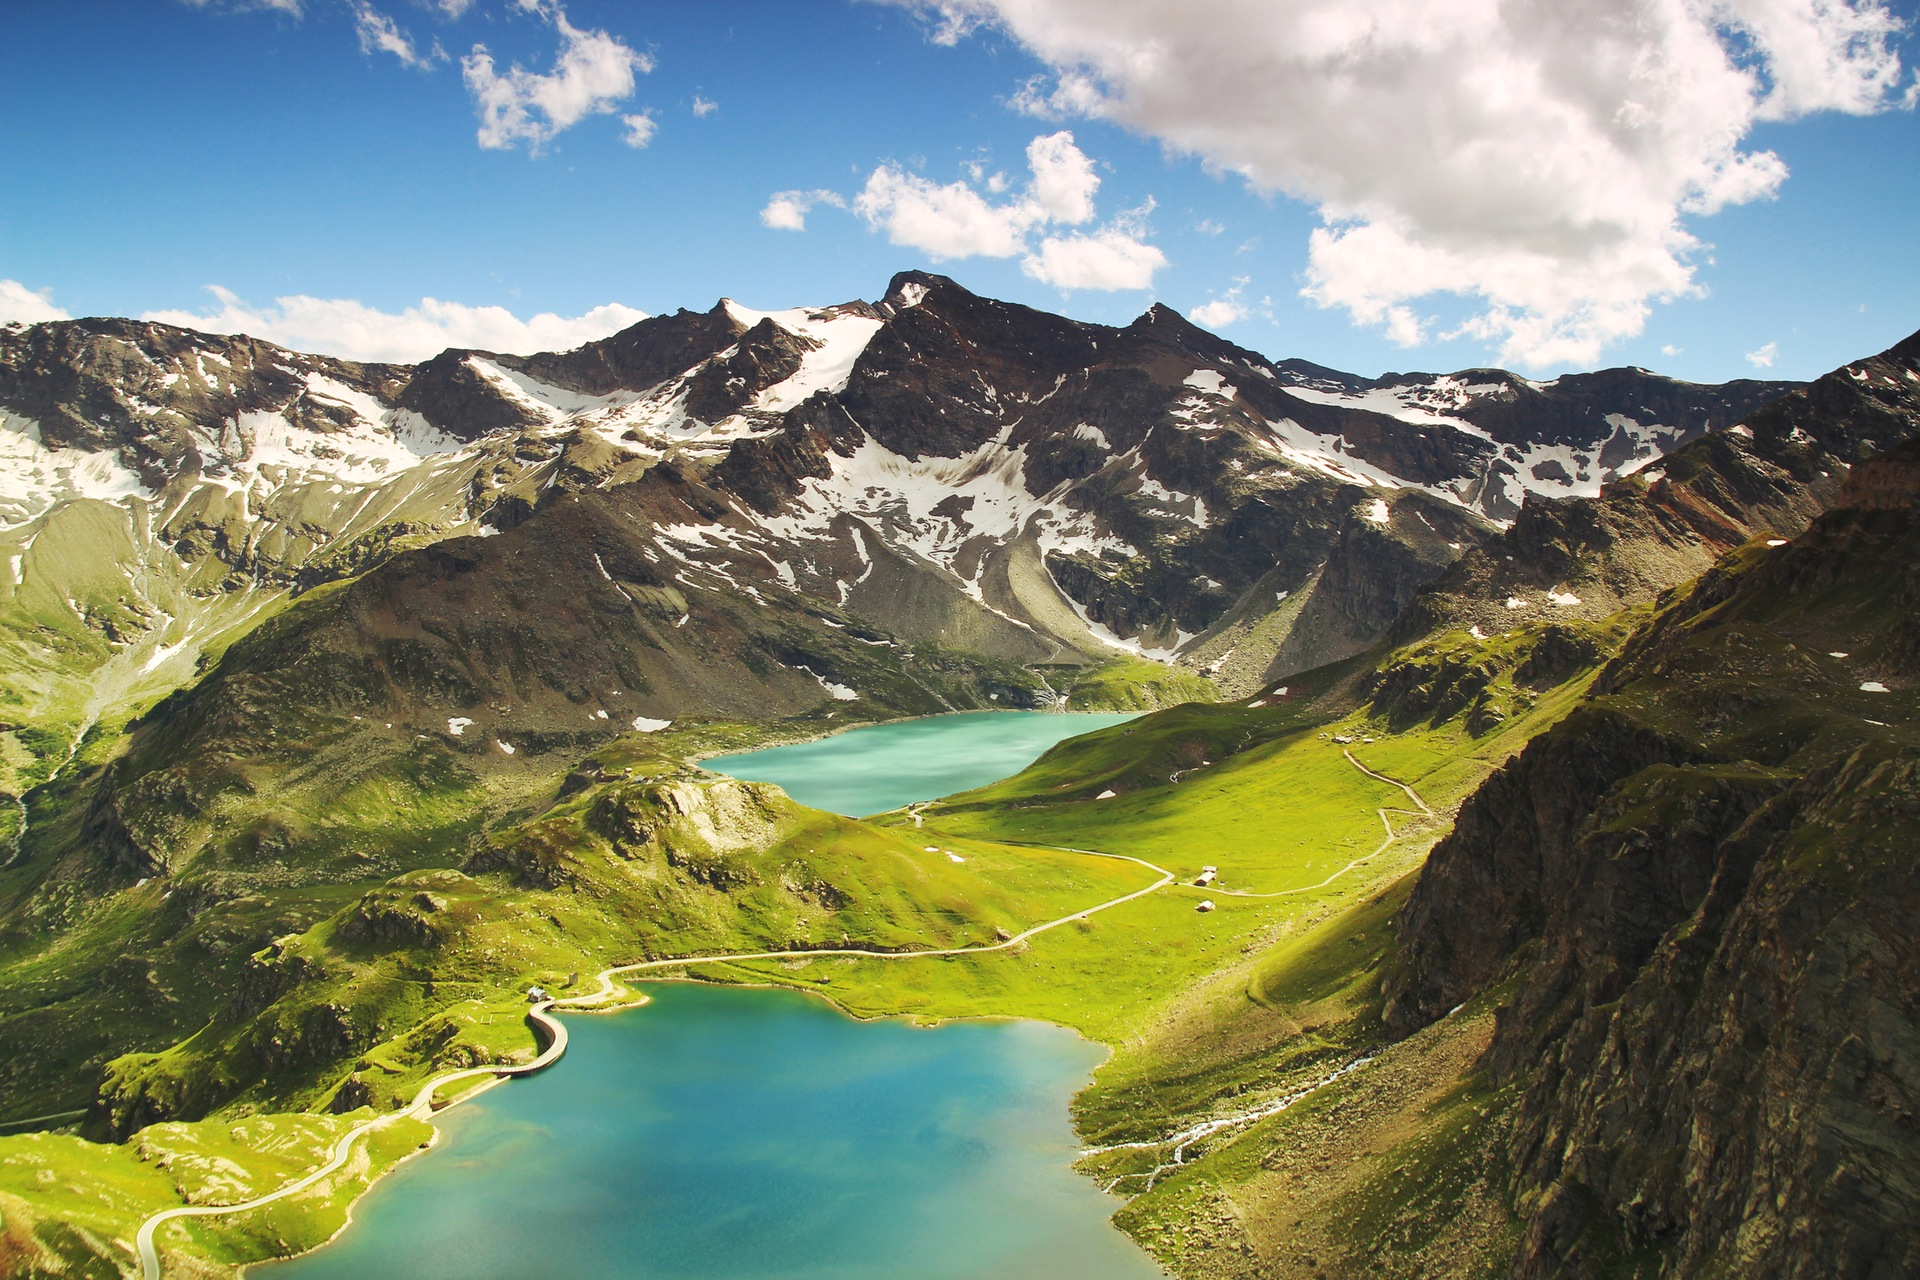 Berge, Pradera, Lake, Schnee, Italien, Landschaft, Luftbild - Wallpaper HD - Prof.-falken.com